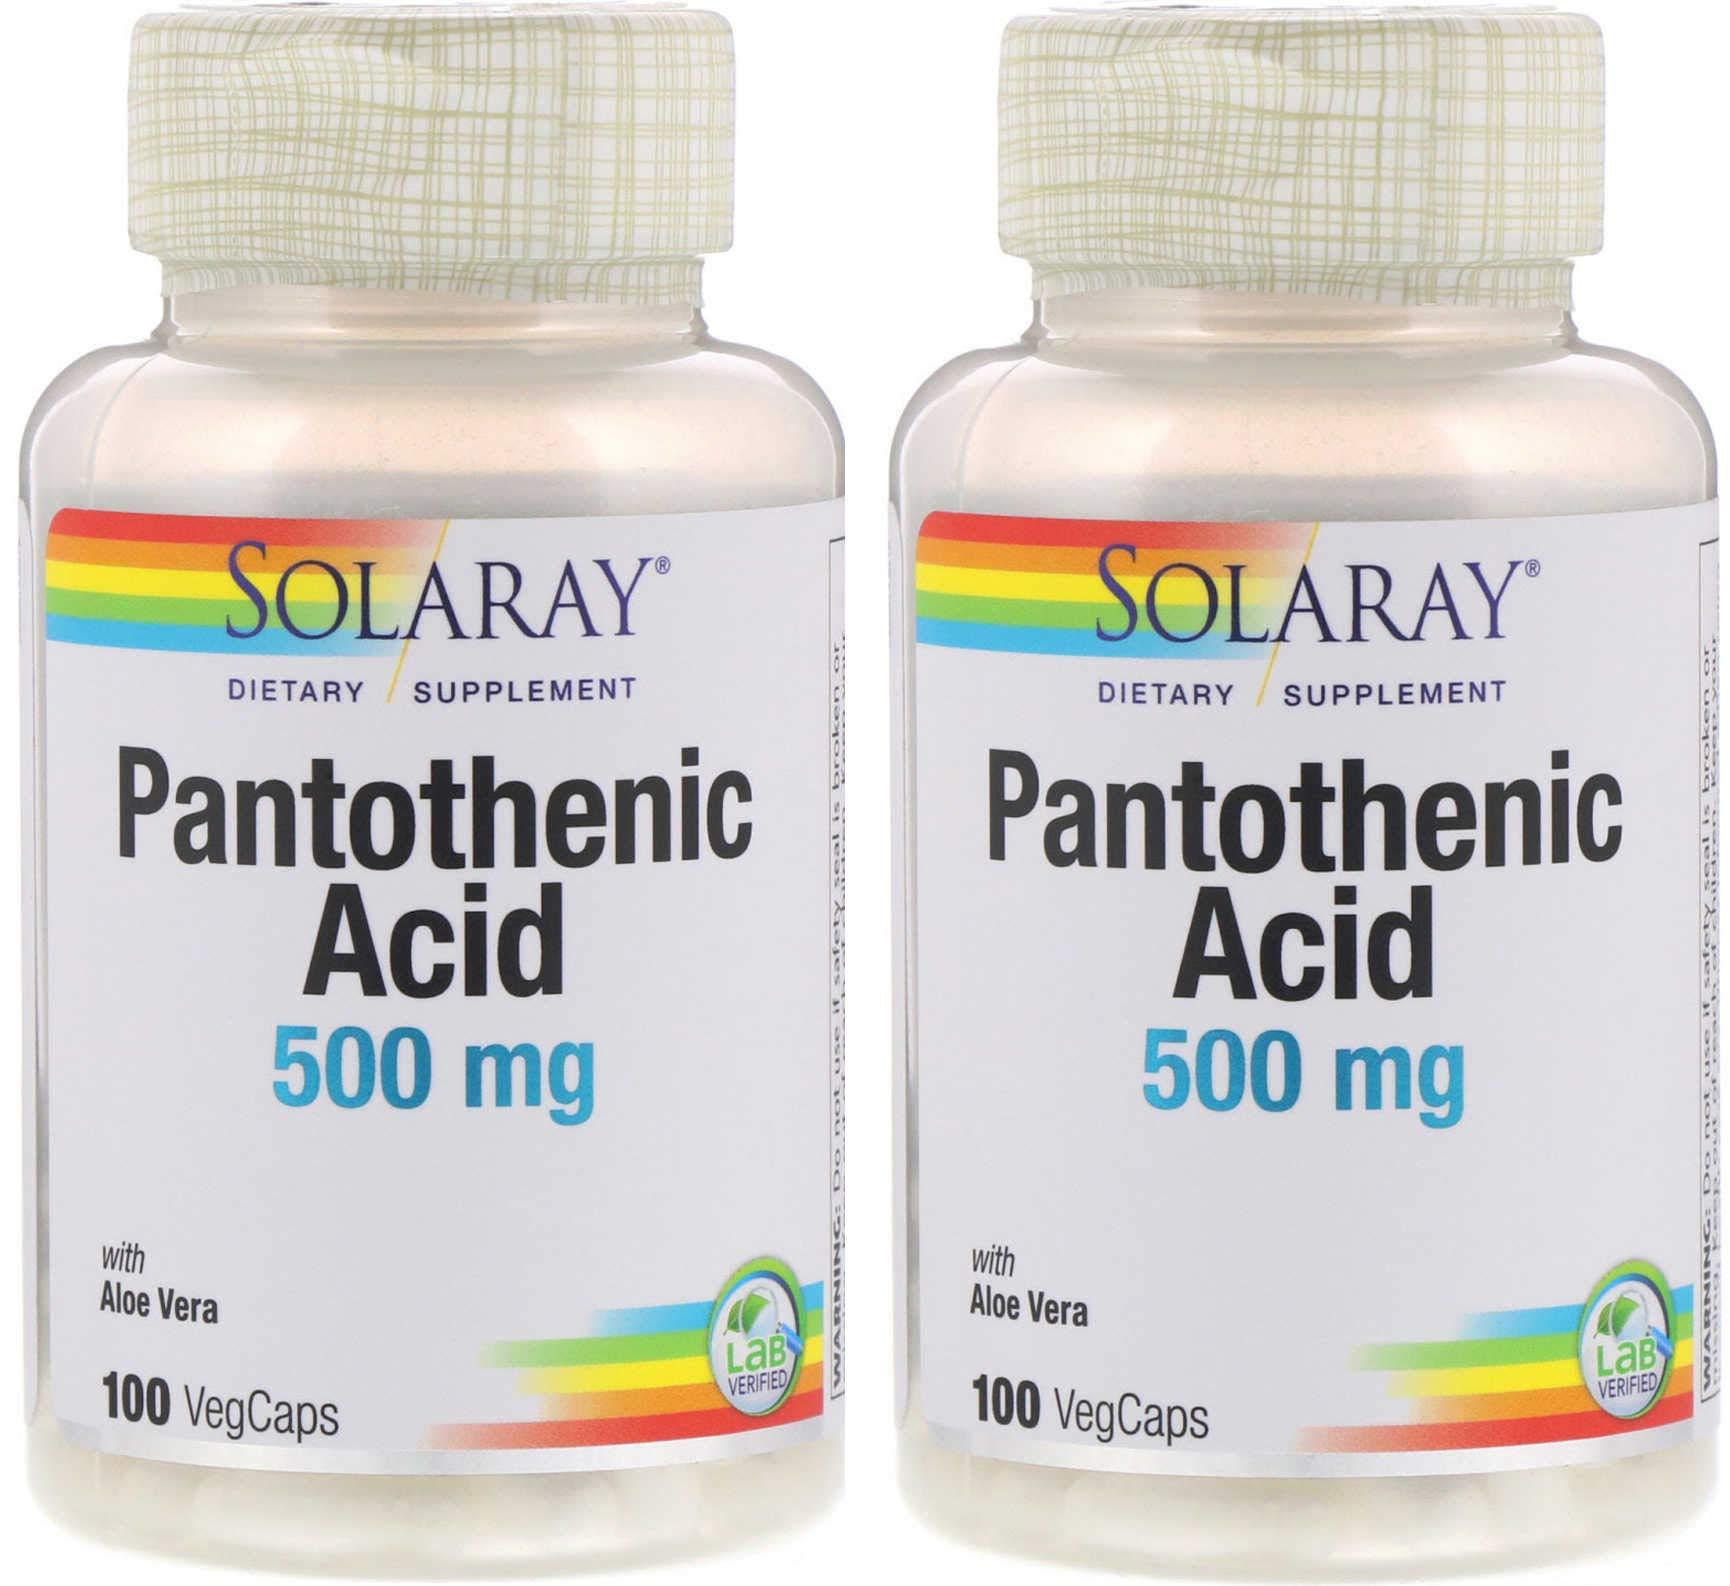 SolaRay Dietary Supplement Pantothenic Acid with Aloe Vera Lab Verified (100 VegCaps) Pack of 2